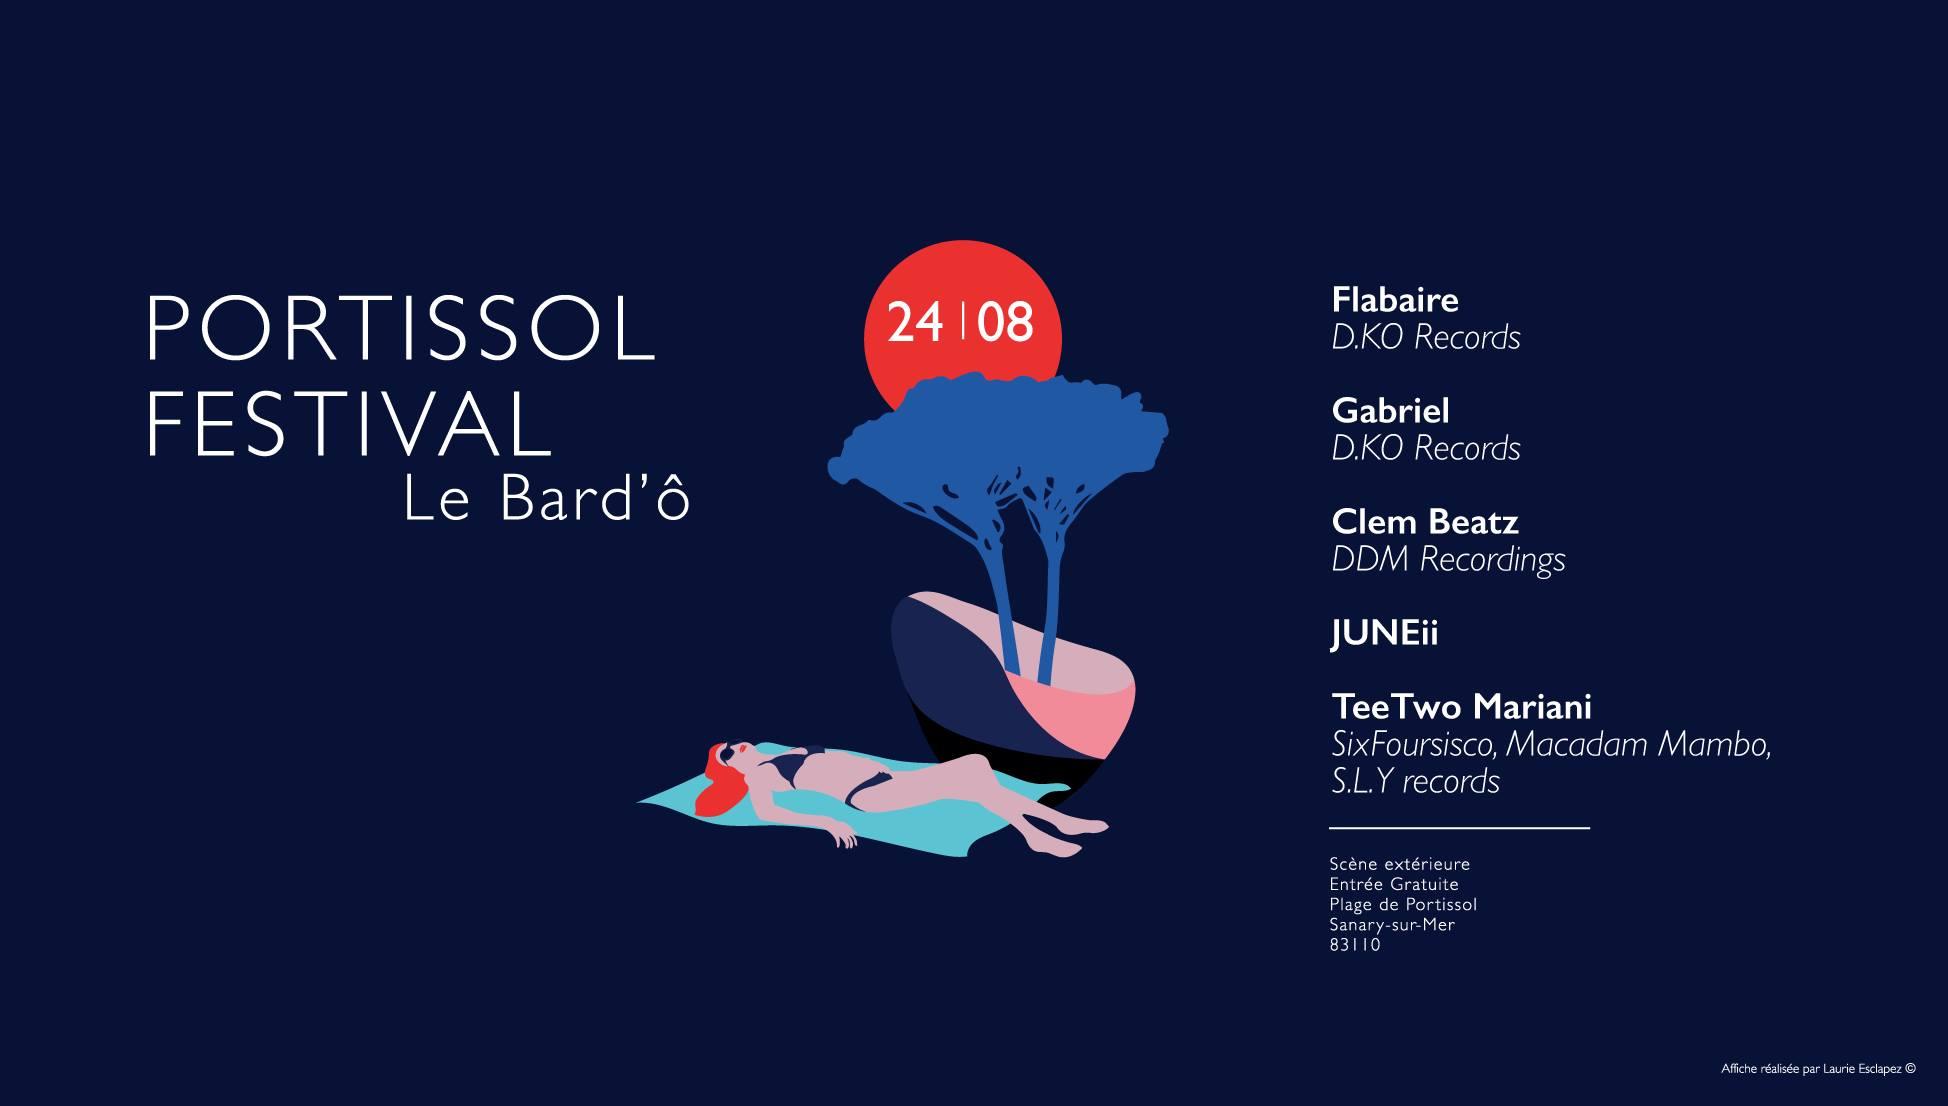 Portissol Festival 2017